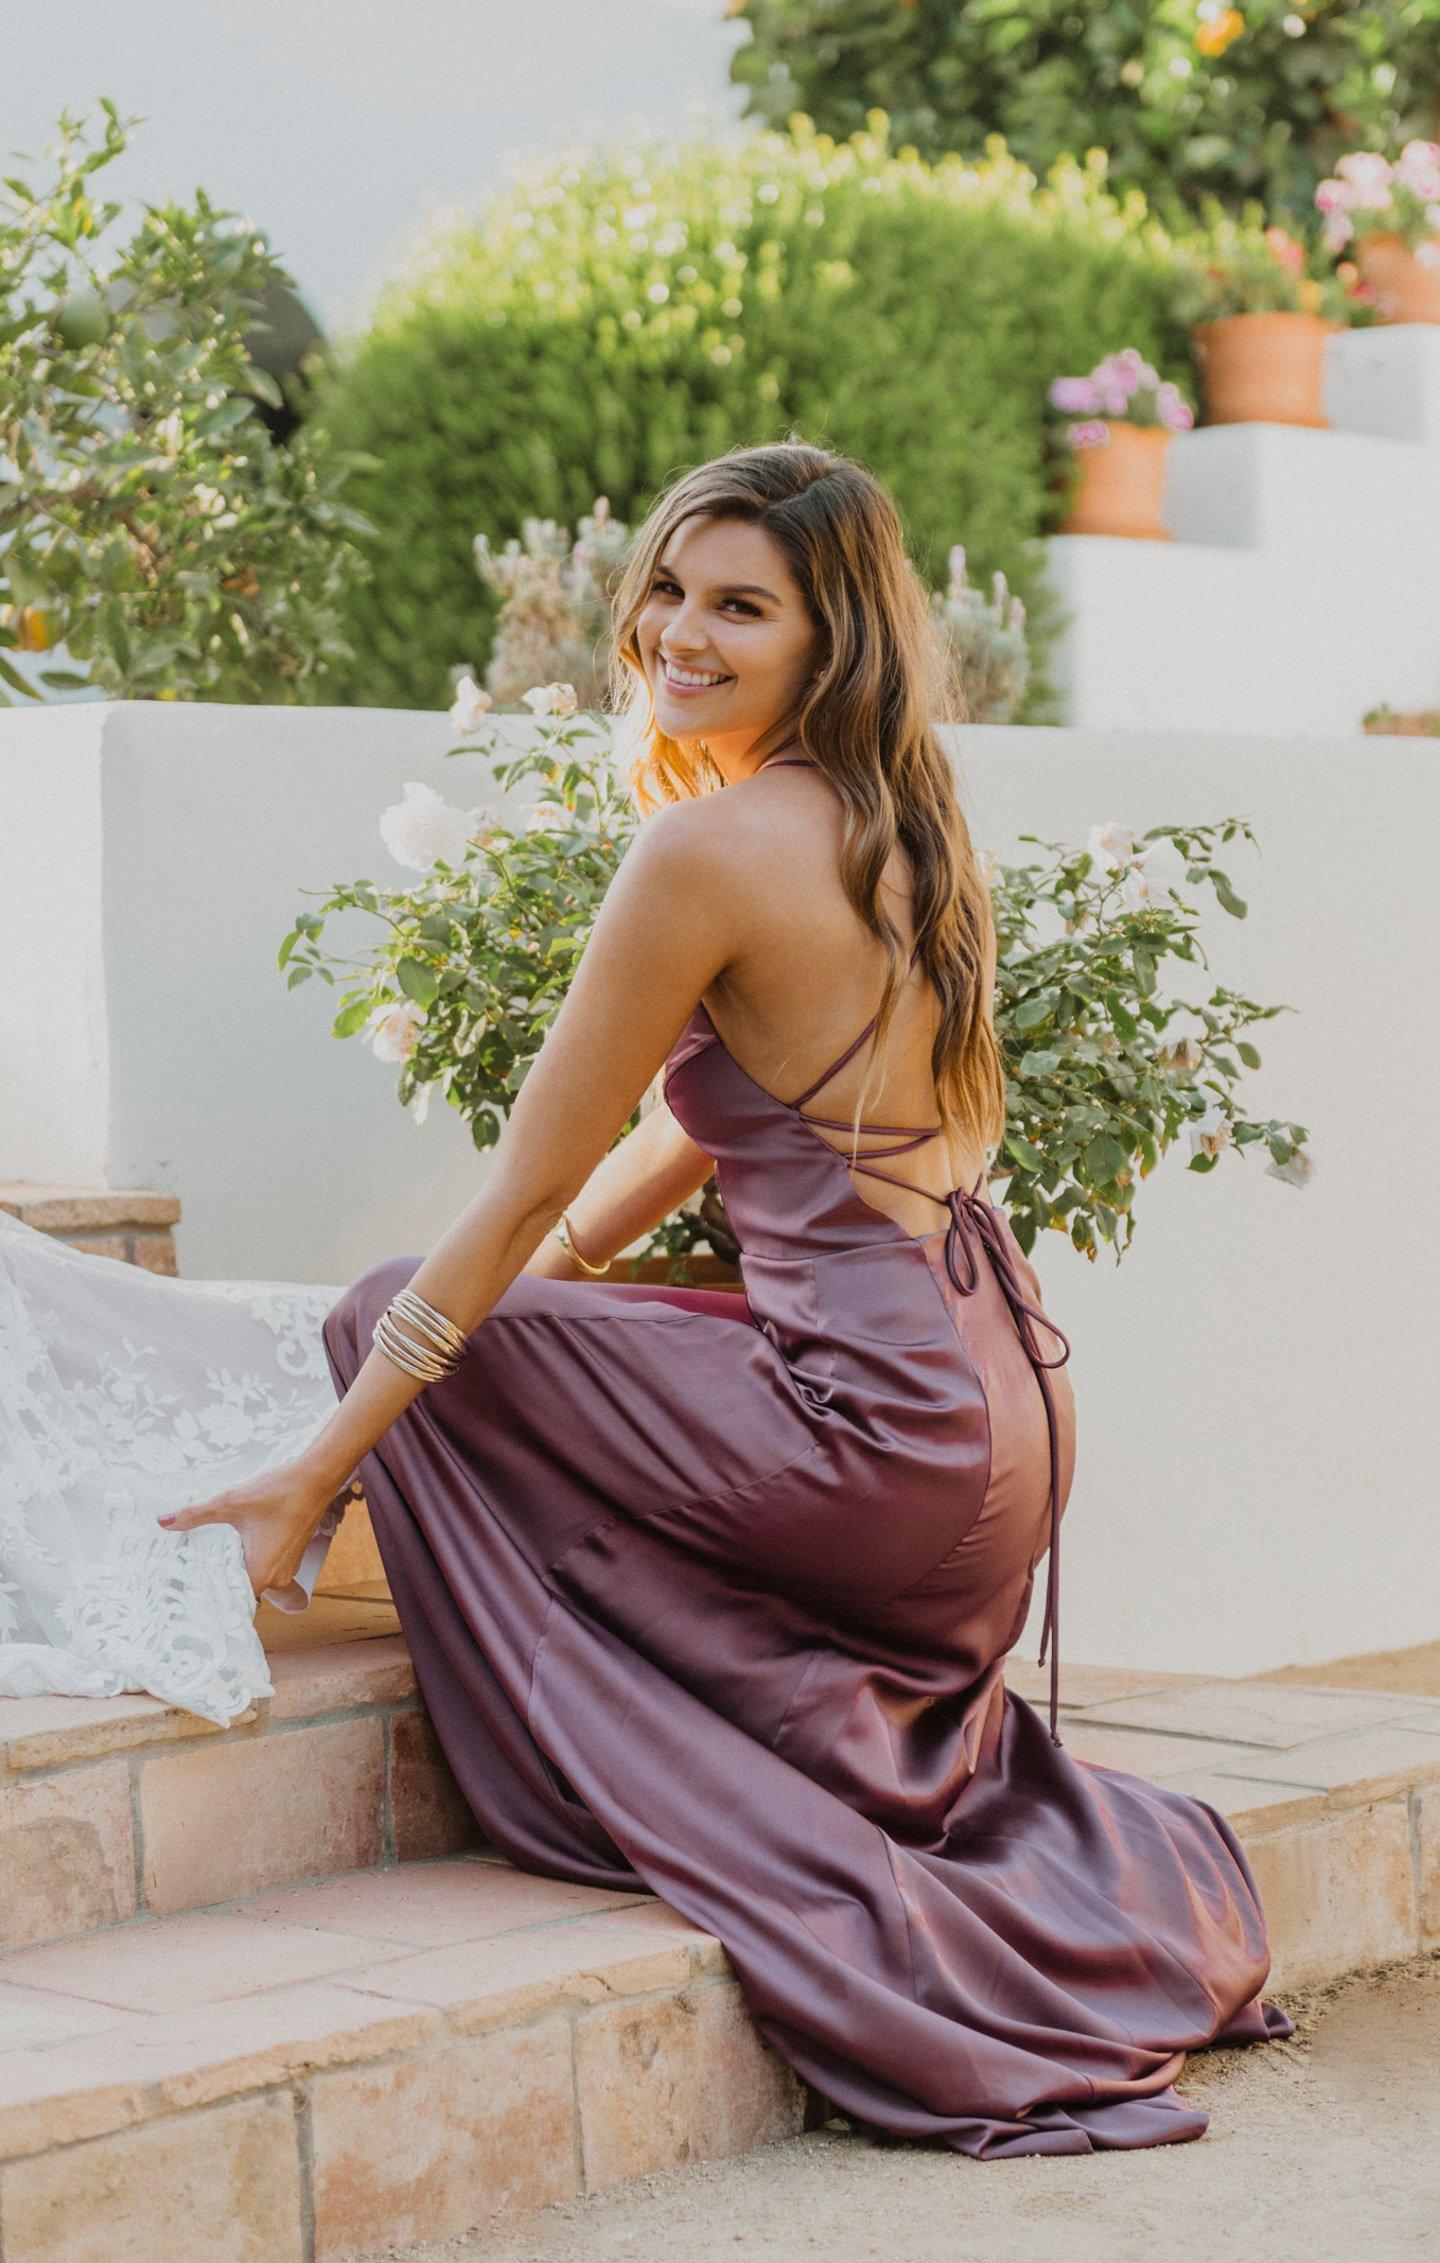 bridesmaid dresses, bridesmaid dress ideas, bridesmaid dress colors, bridesmaid dress styles, purple bridesmaid dress, plum bridesmaid dress